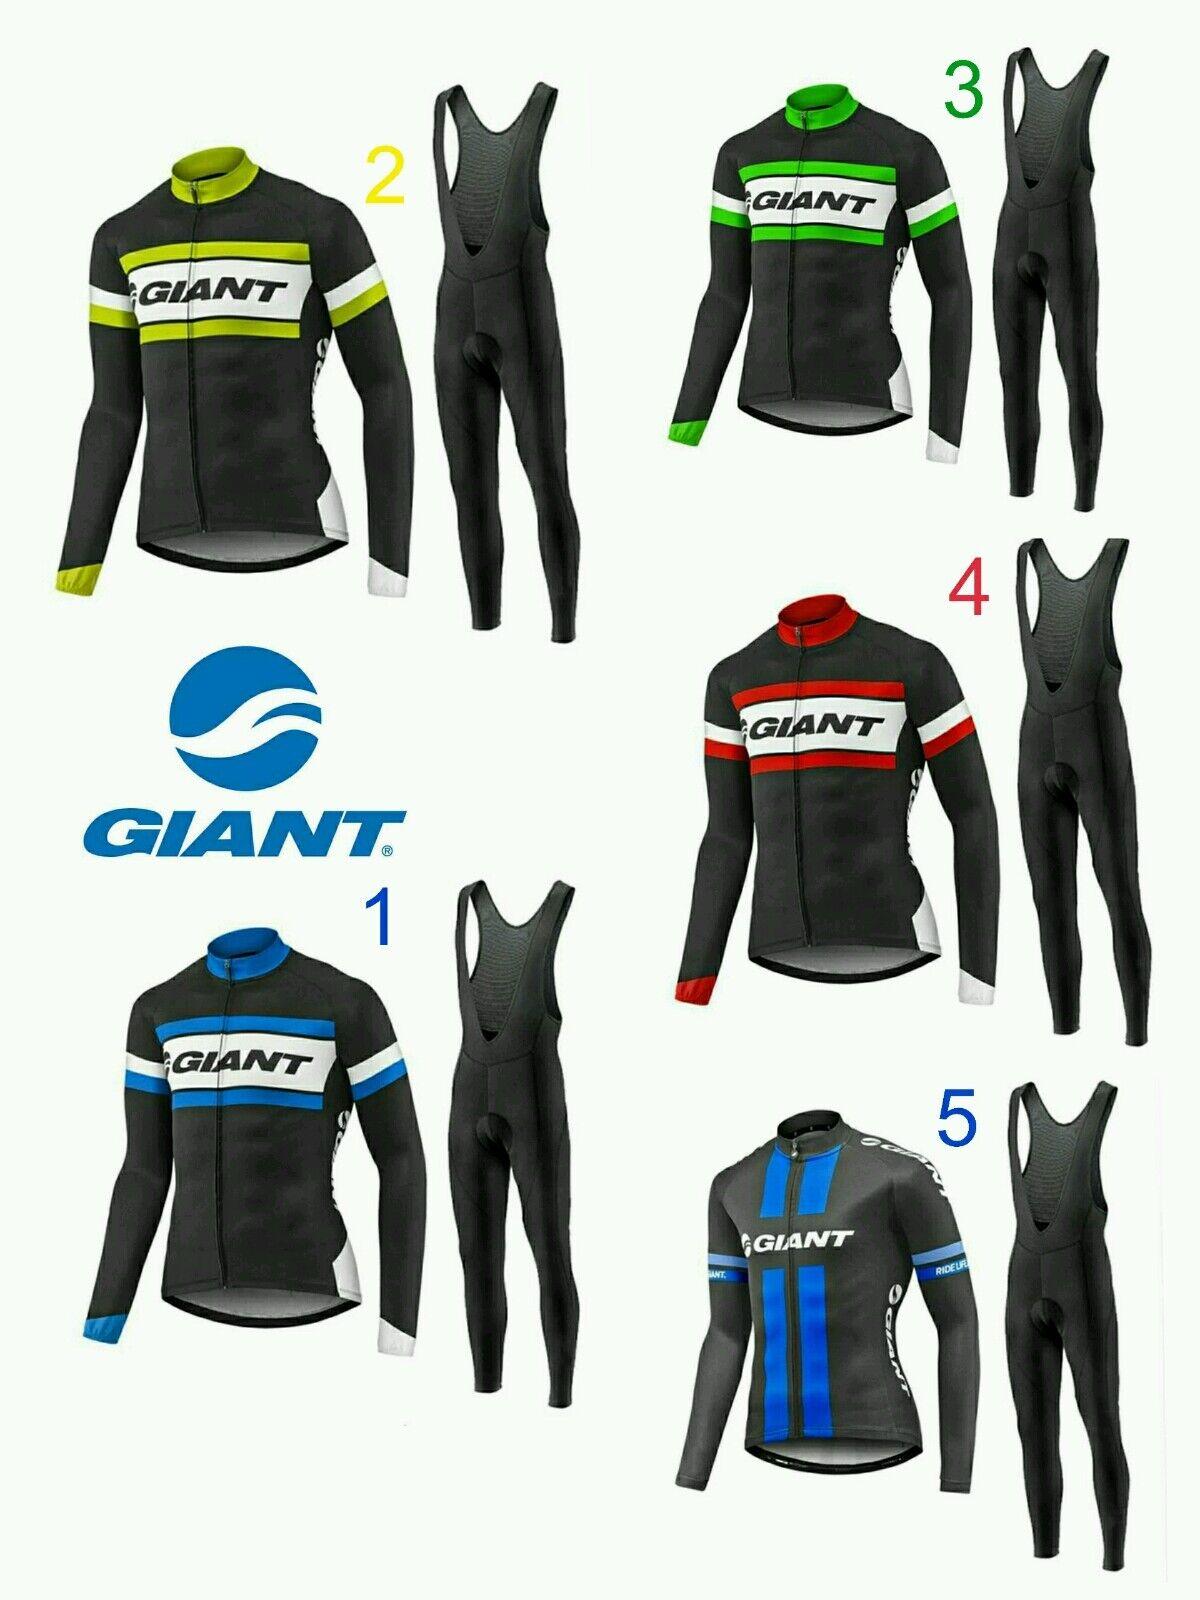 Equipacion invierno giant maillot culotte mtb ciclismo triatlon btt modelos 2017